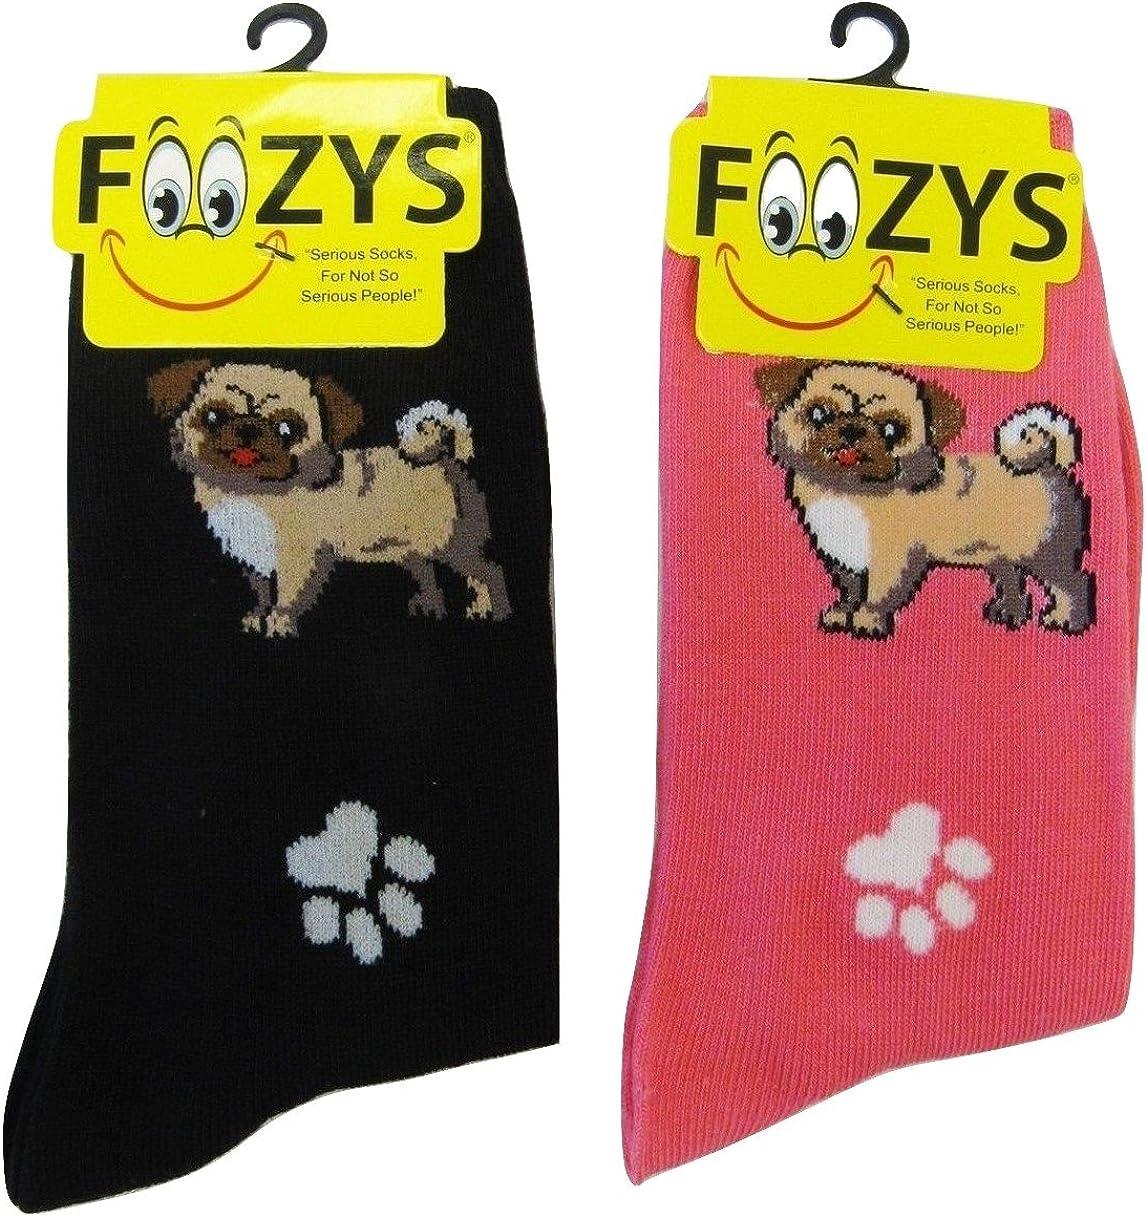 2 Pair Cute Animal Themed Fashion Novelty Socks Foozys Women/'s Crew Socks